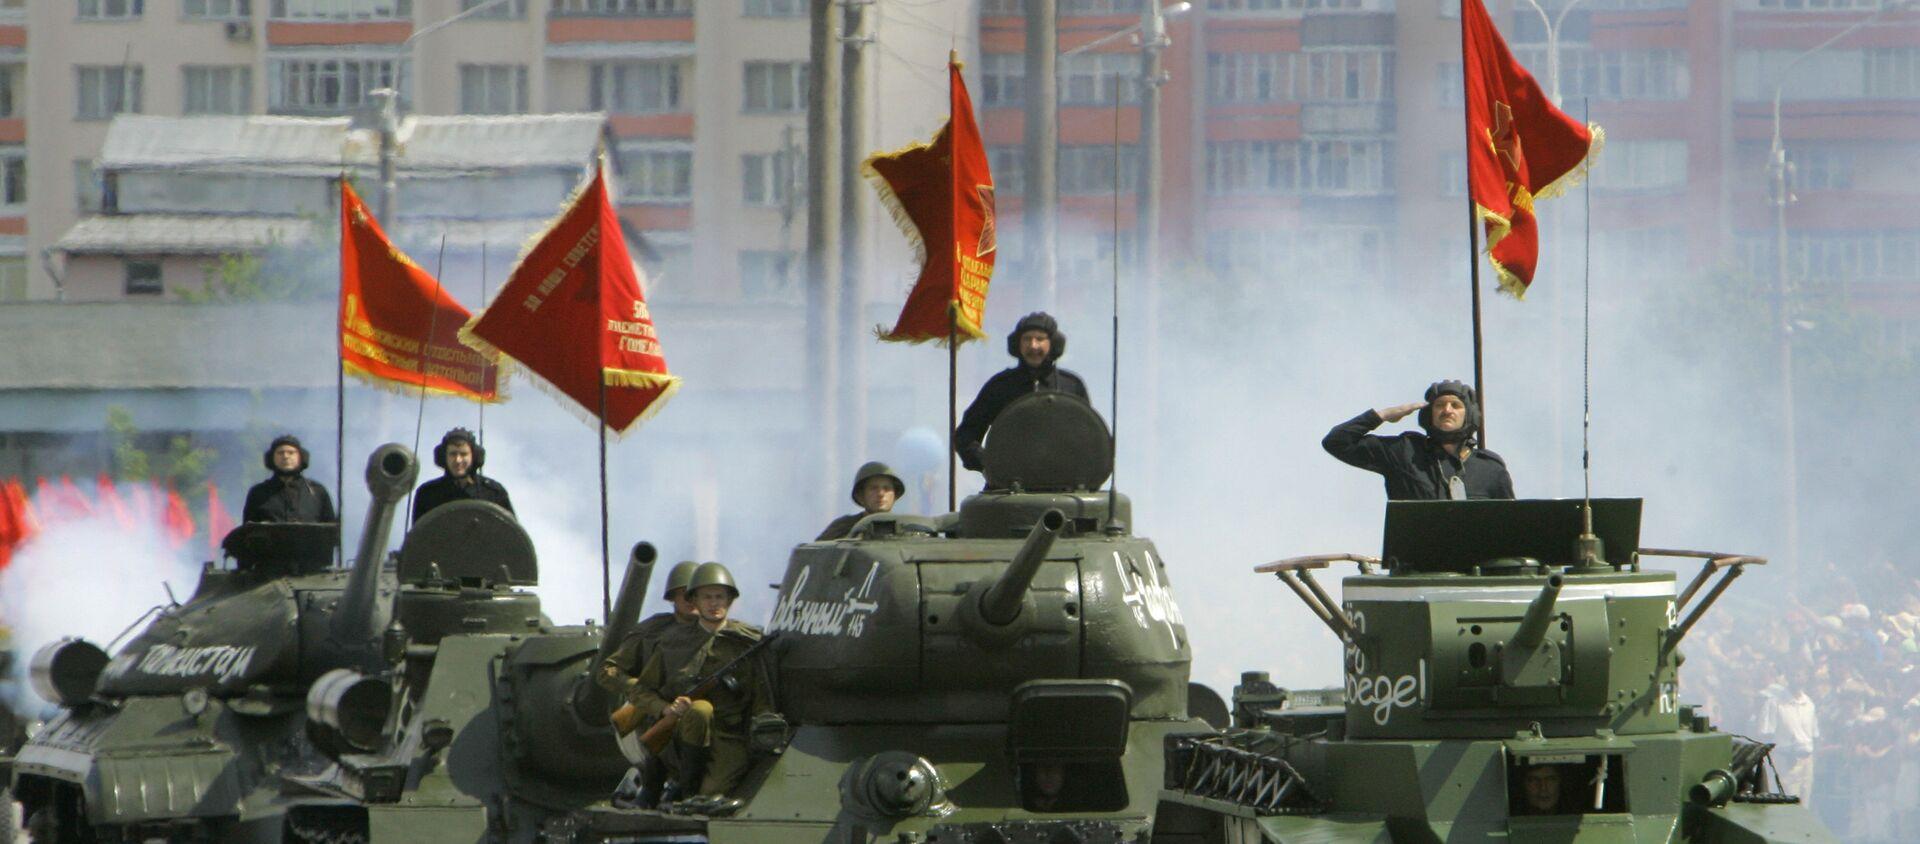 Parada wojskowa na Białorusi - Sputnik Polska, 1920, 27.09.2019